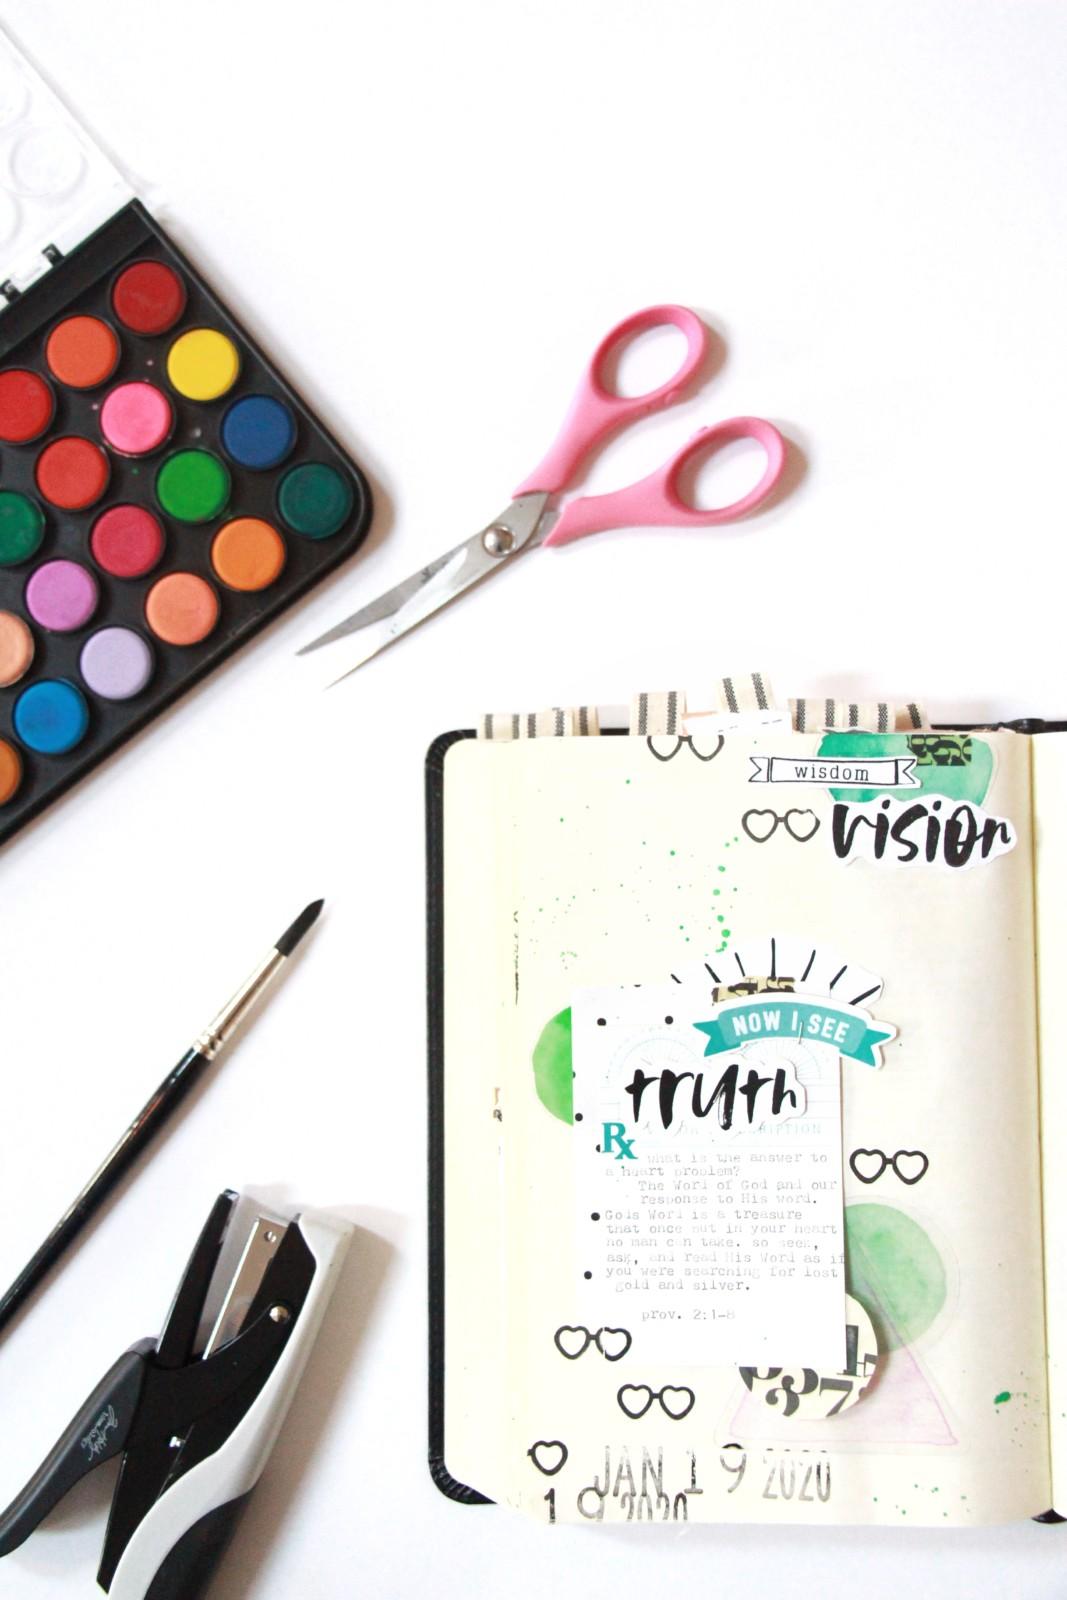 Bible Journaling by Bekah Lynn   Wisdom Vision   2020 Vision Kit   Proverbs 2:1-8